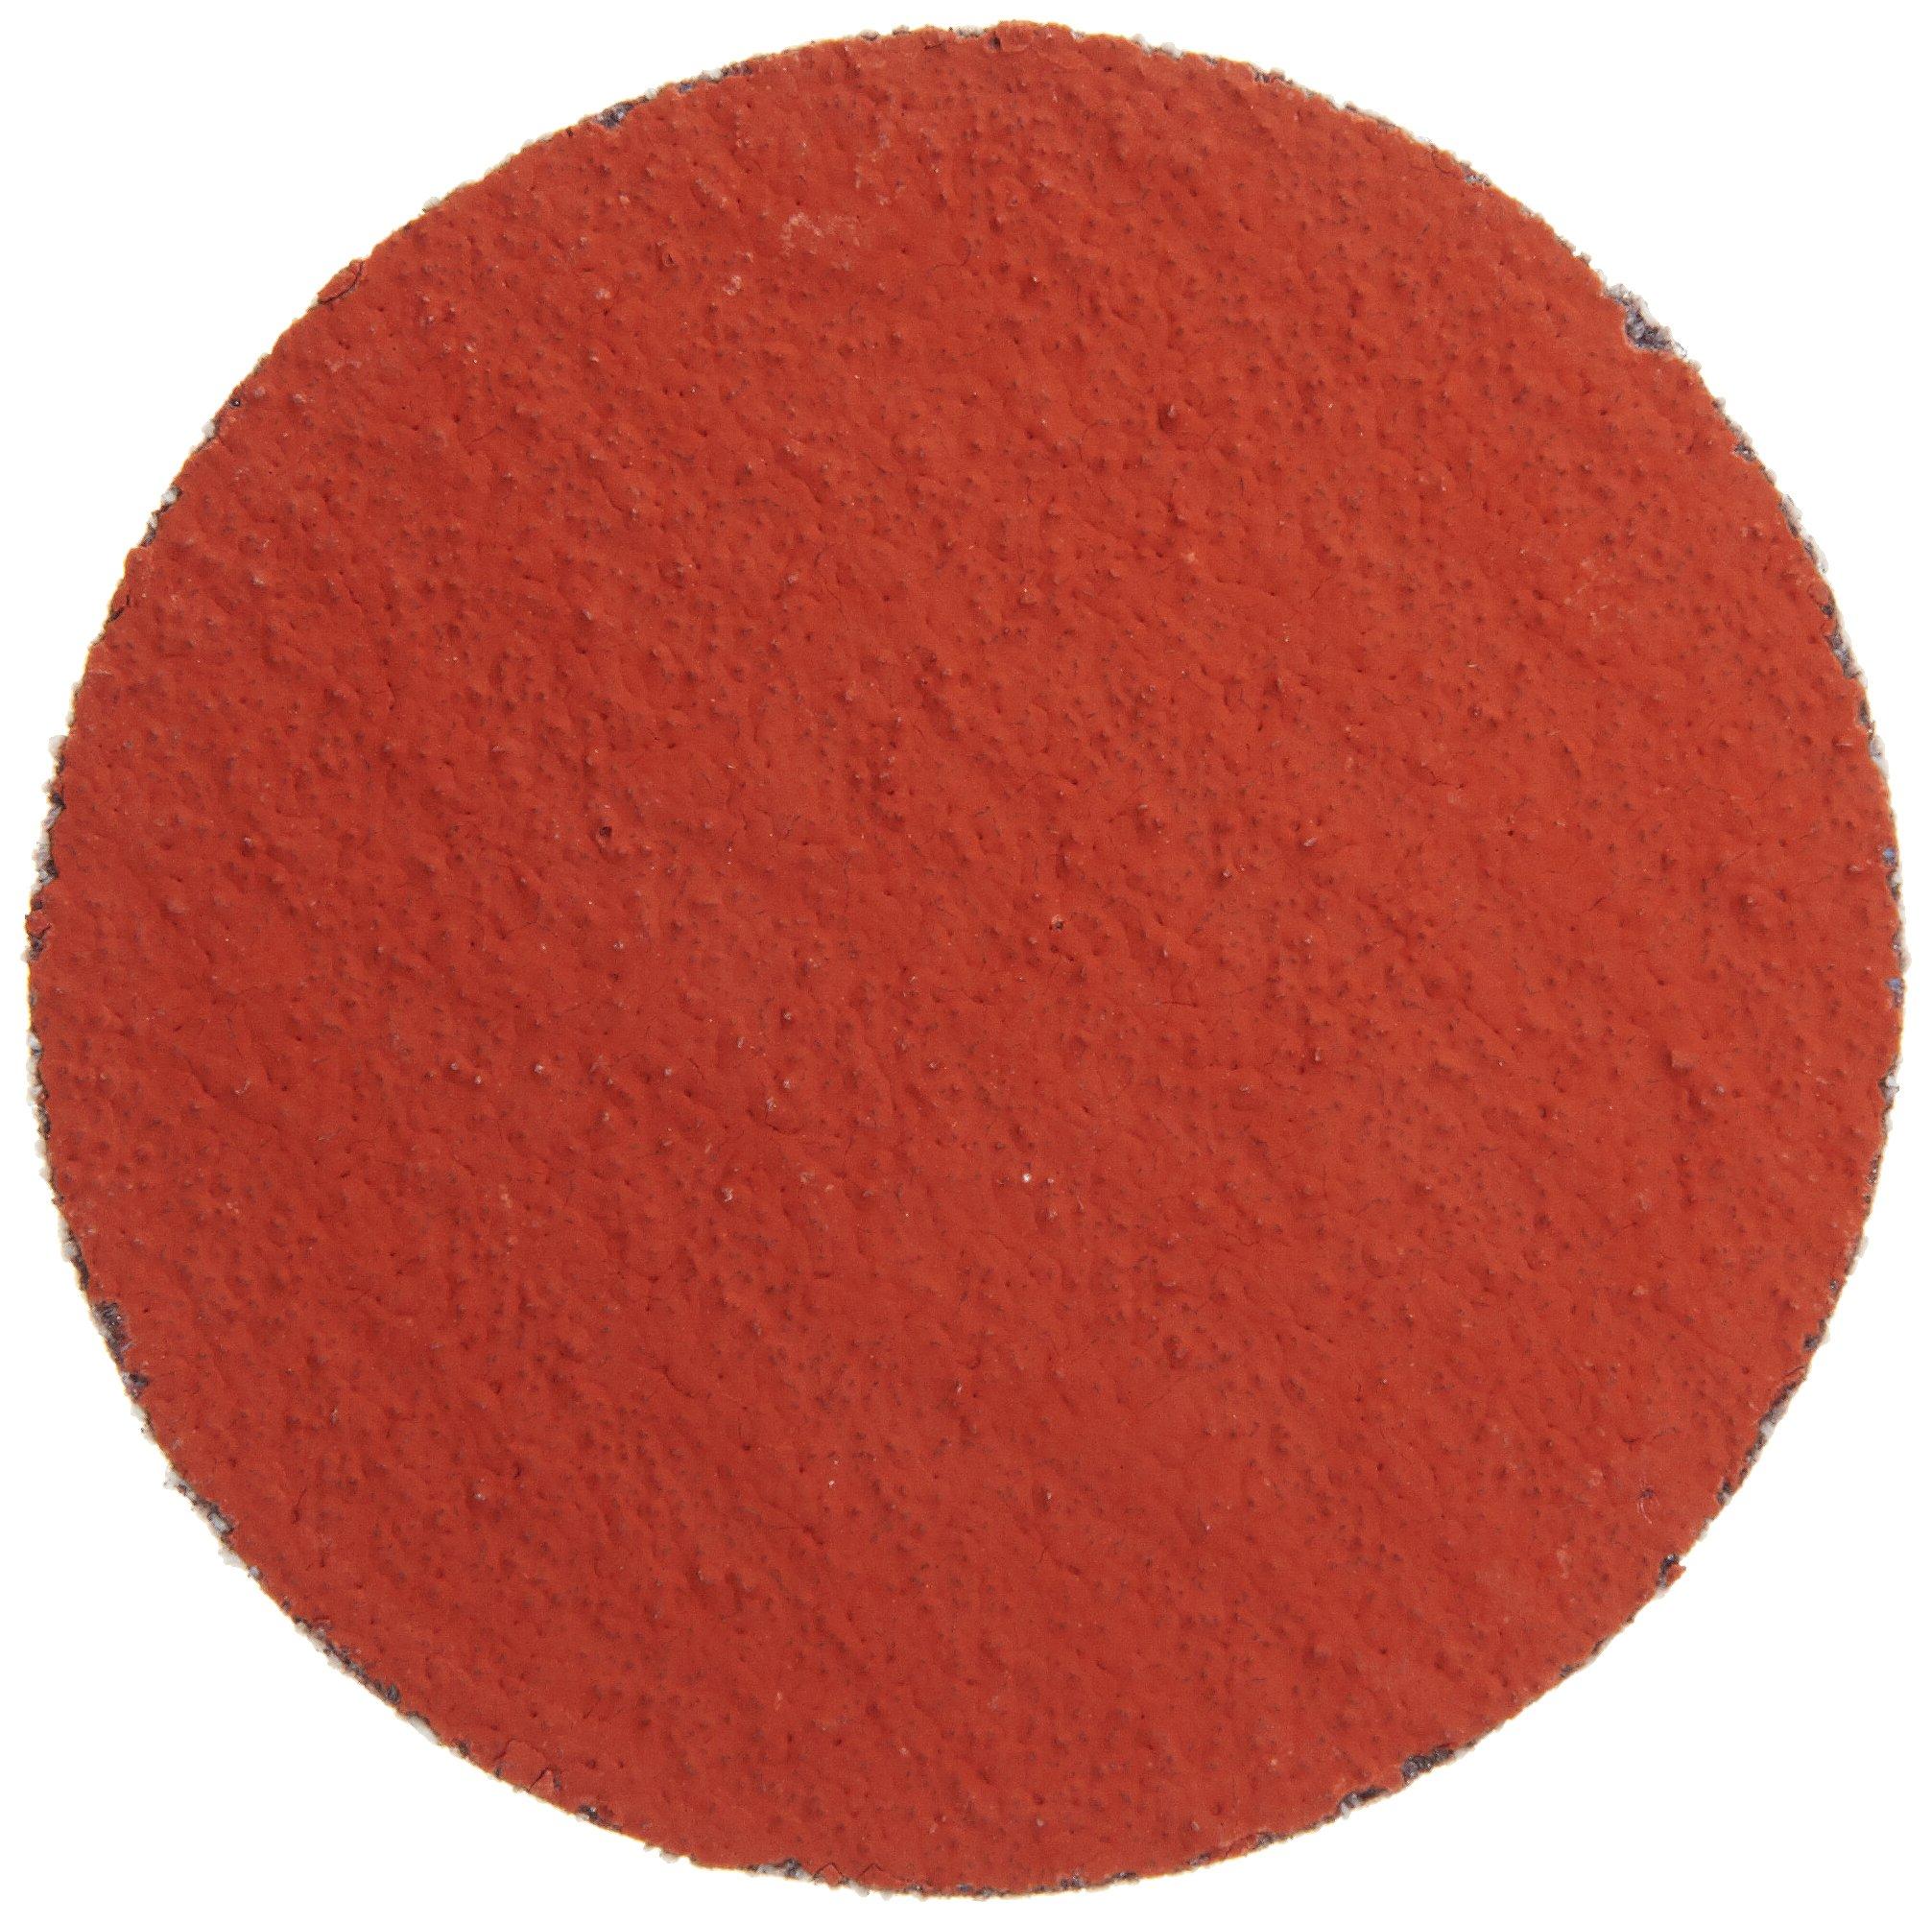 3M Roloc Disc 777F, Cloth, TR Attachment, Ceramic Aluminum Oxide, 2'' Diameter, 80 Grit (Pack of 50) by Cubitron